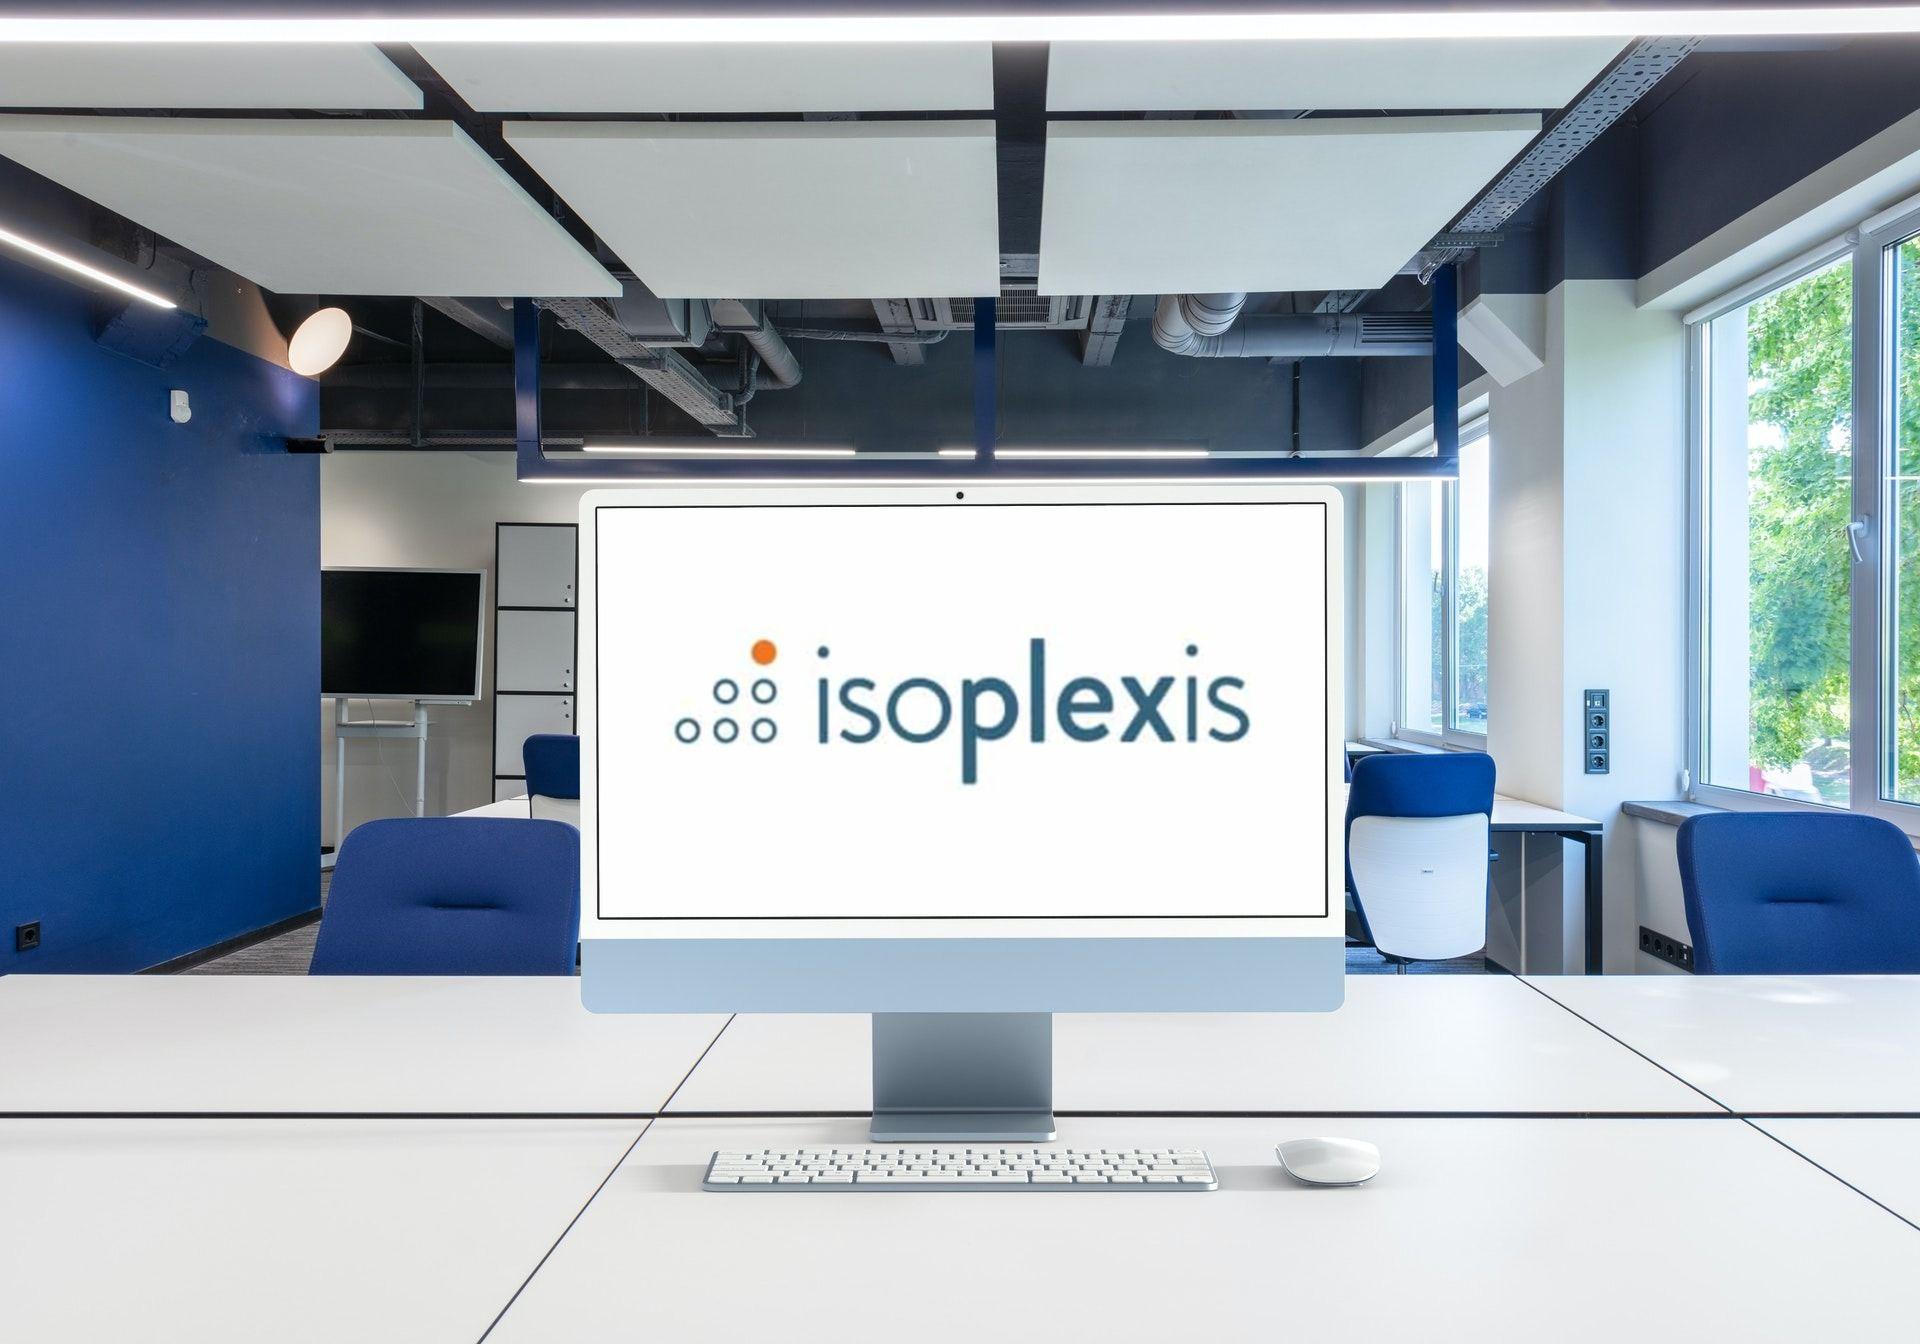 IsoPlexis Initial Public Offering